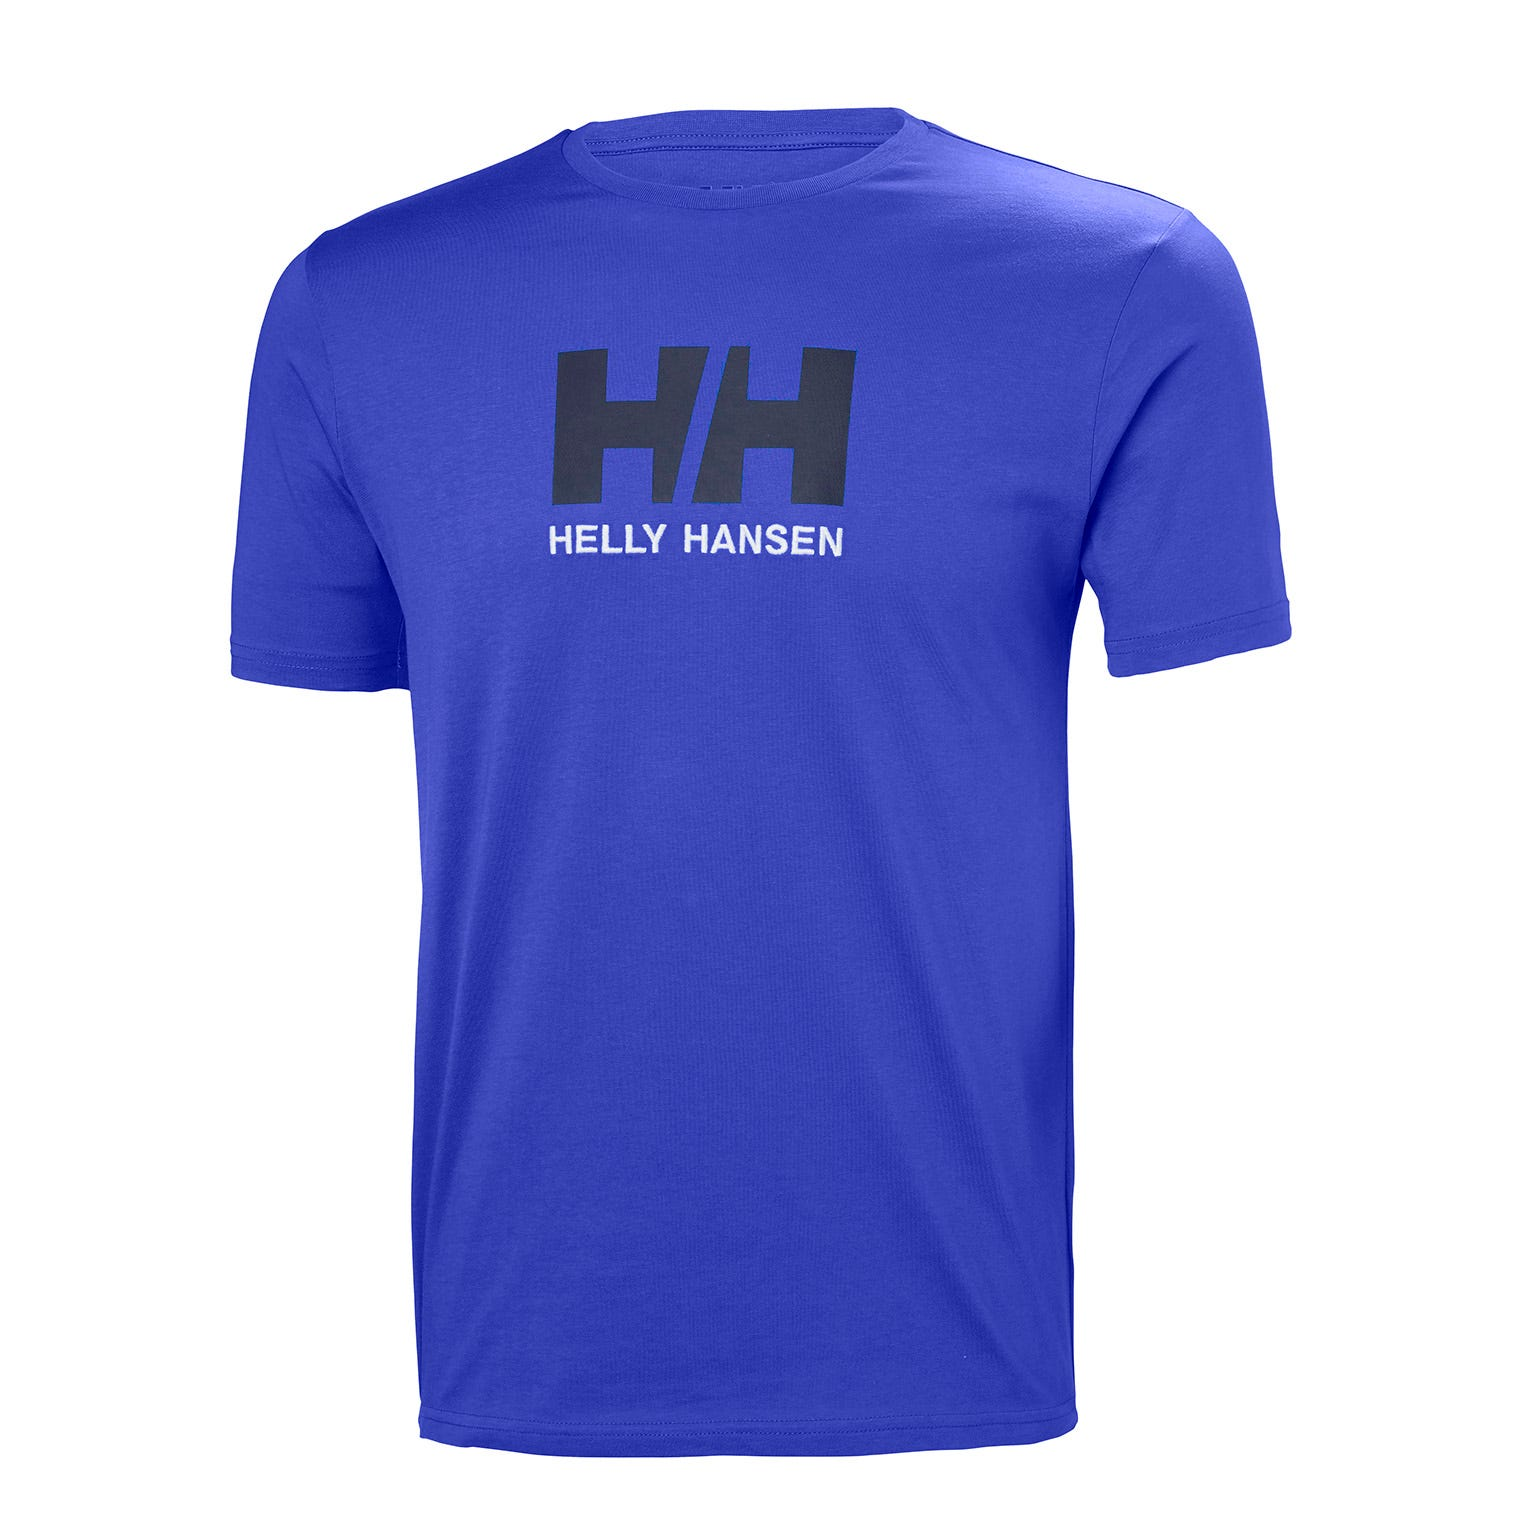 Helly Hansen Mens Hh Logo Tshirt Blue L